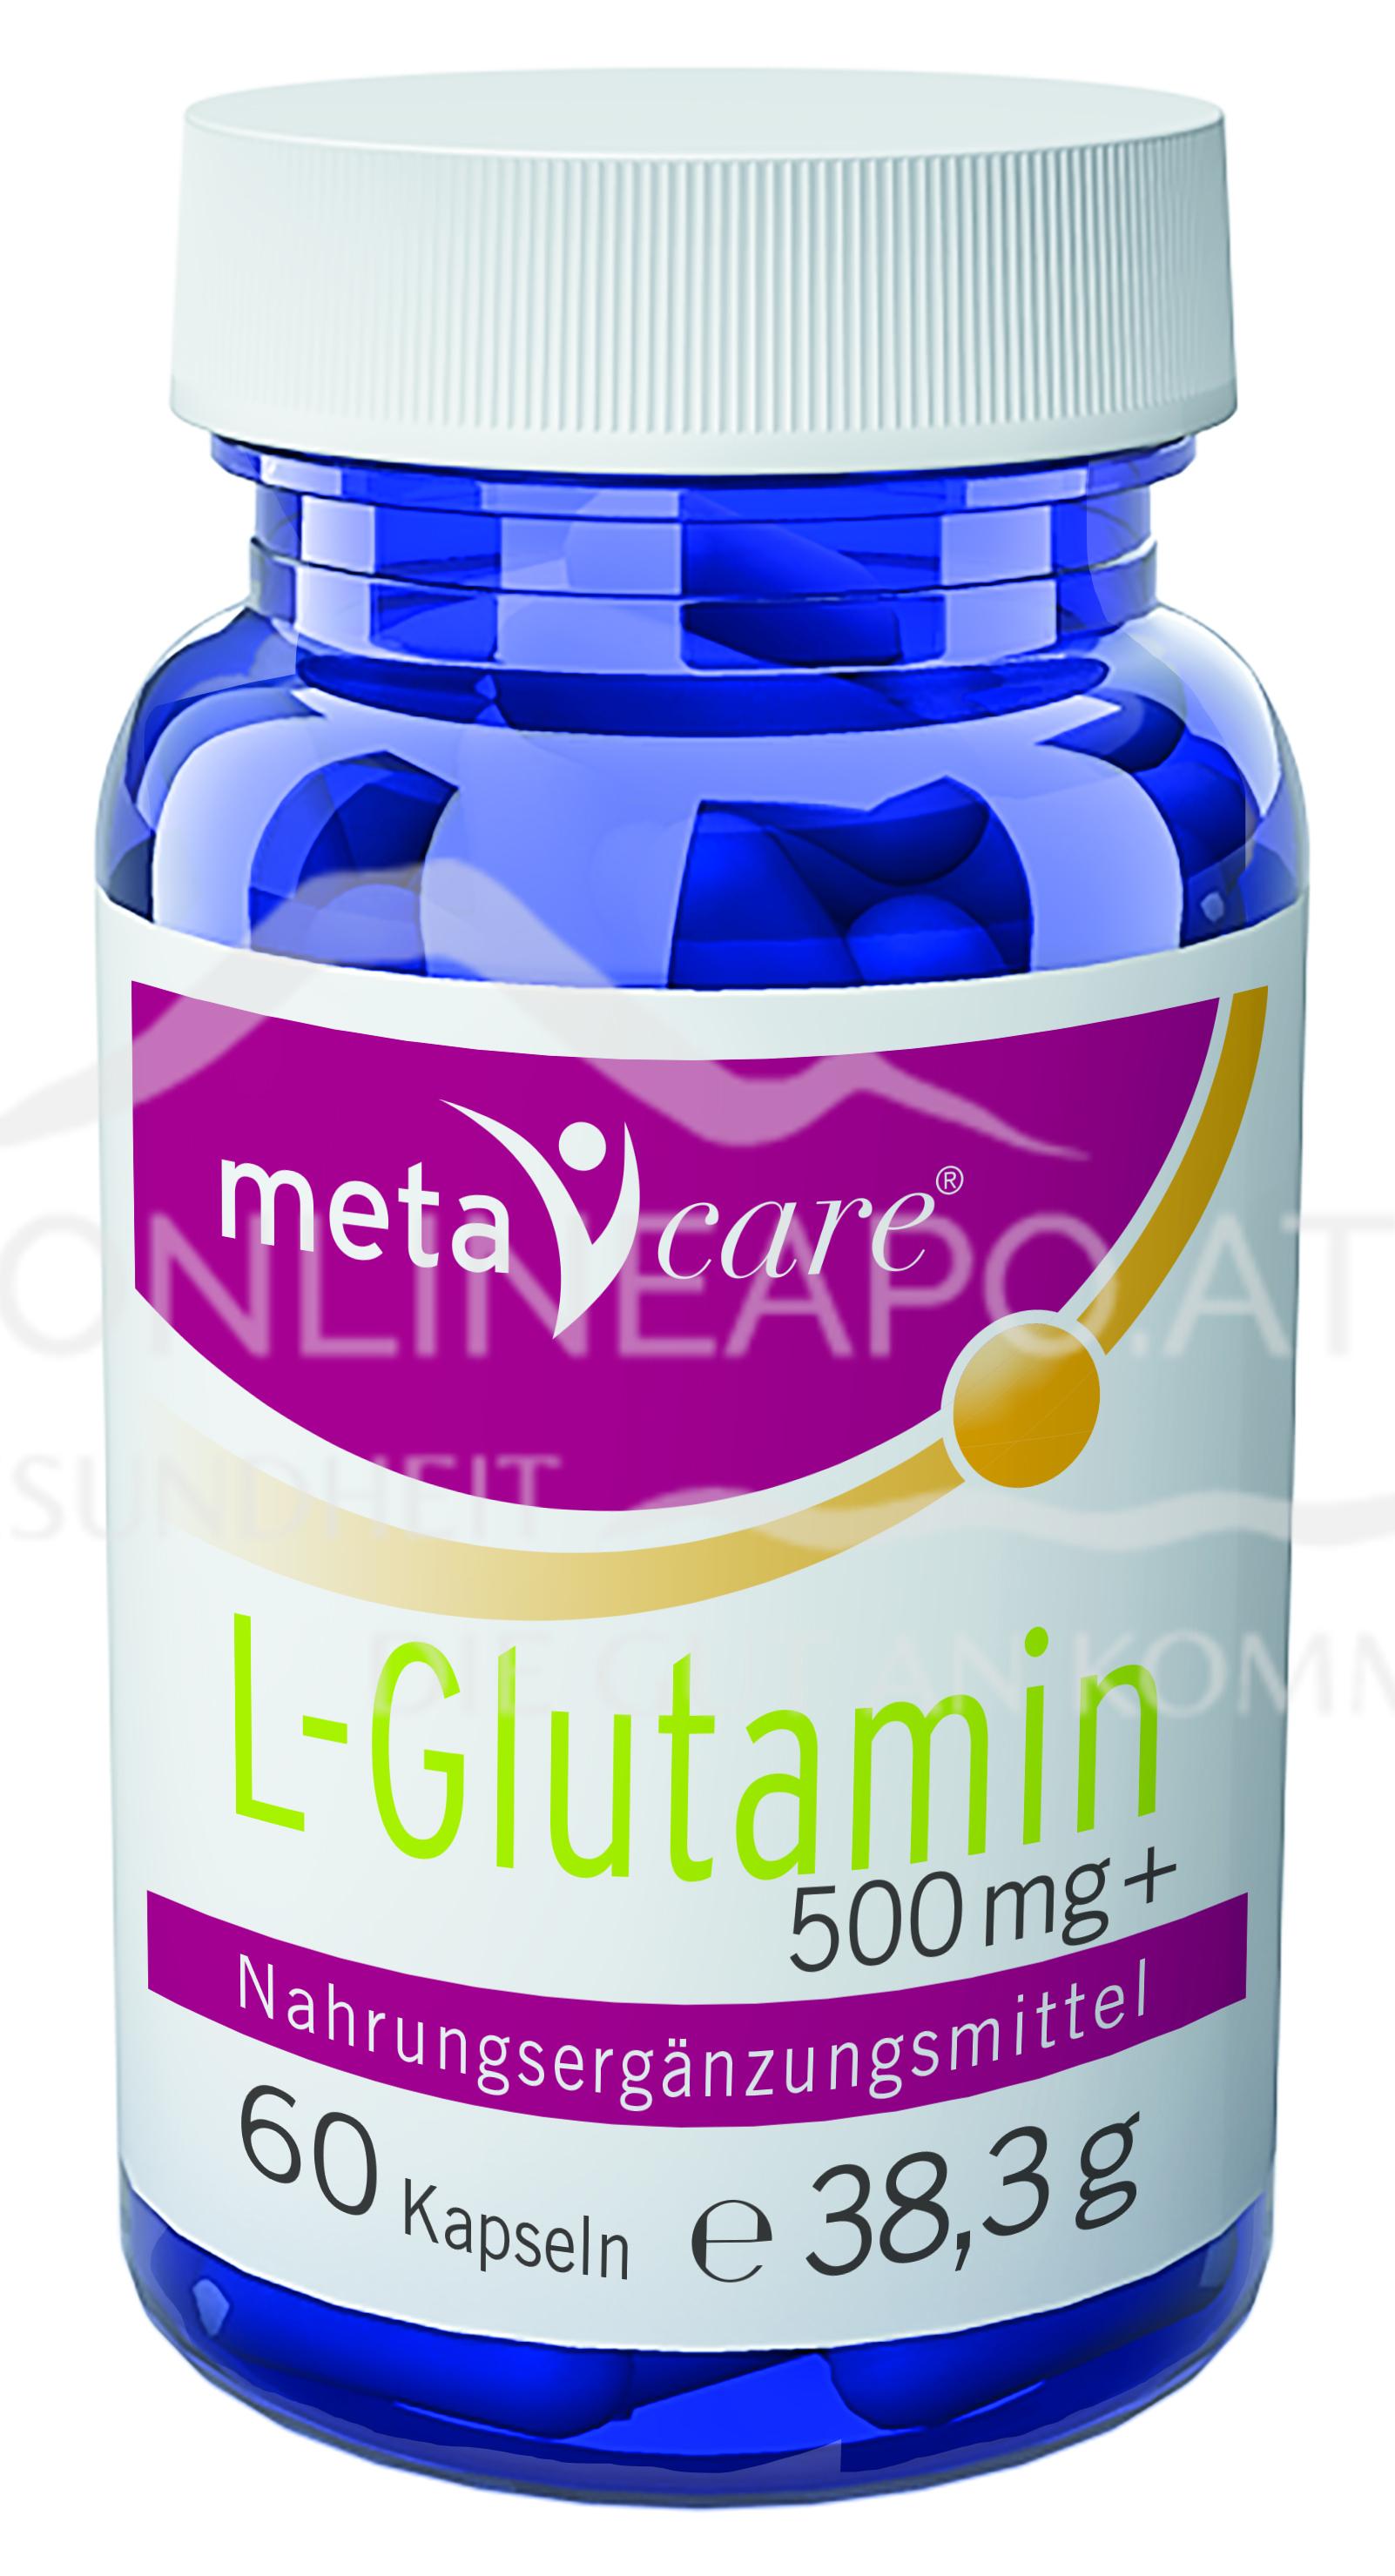 metacare® L-Glutamin 500 mg +